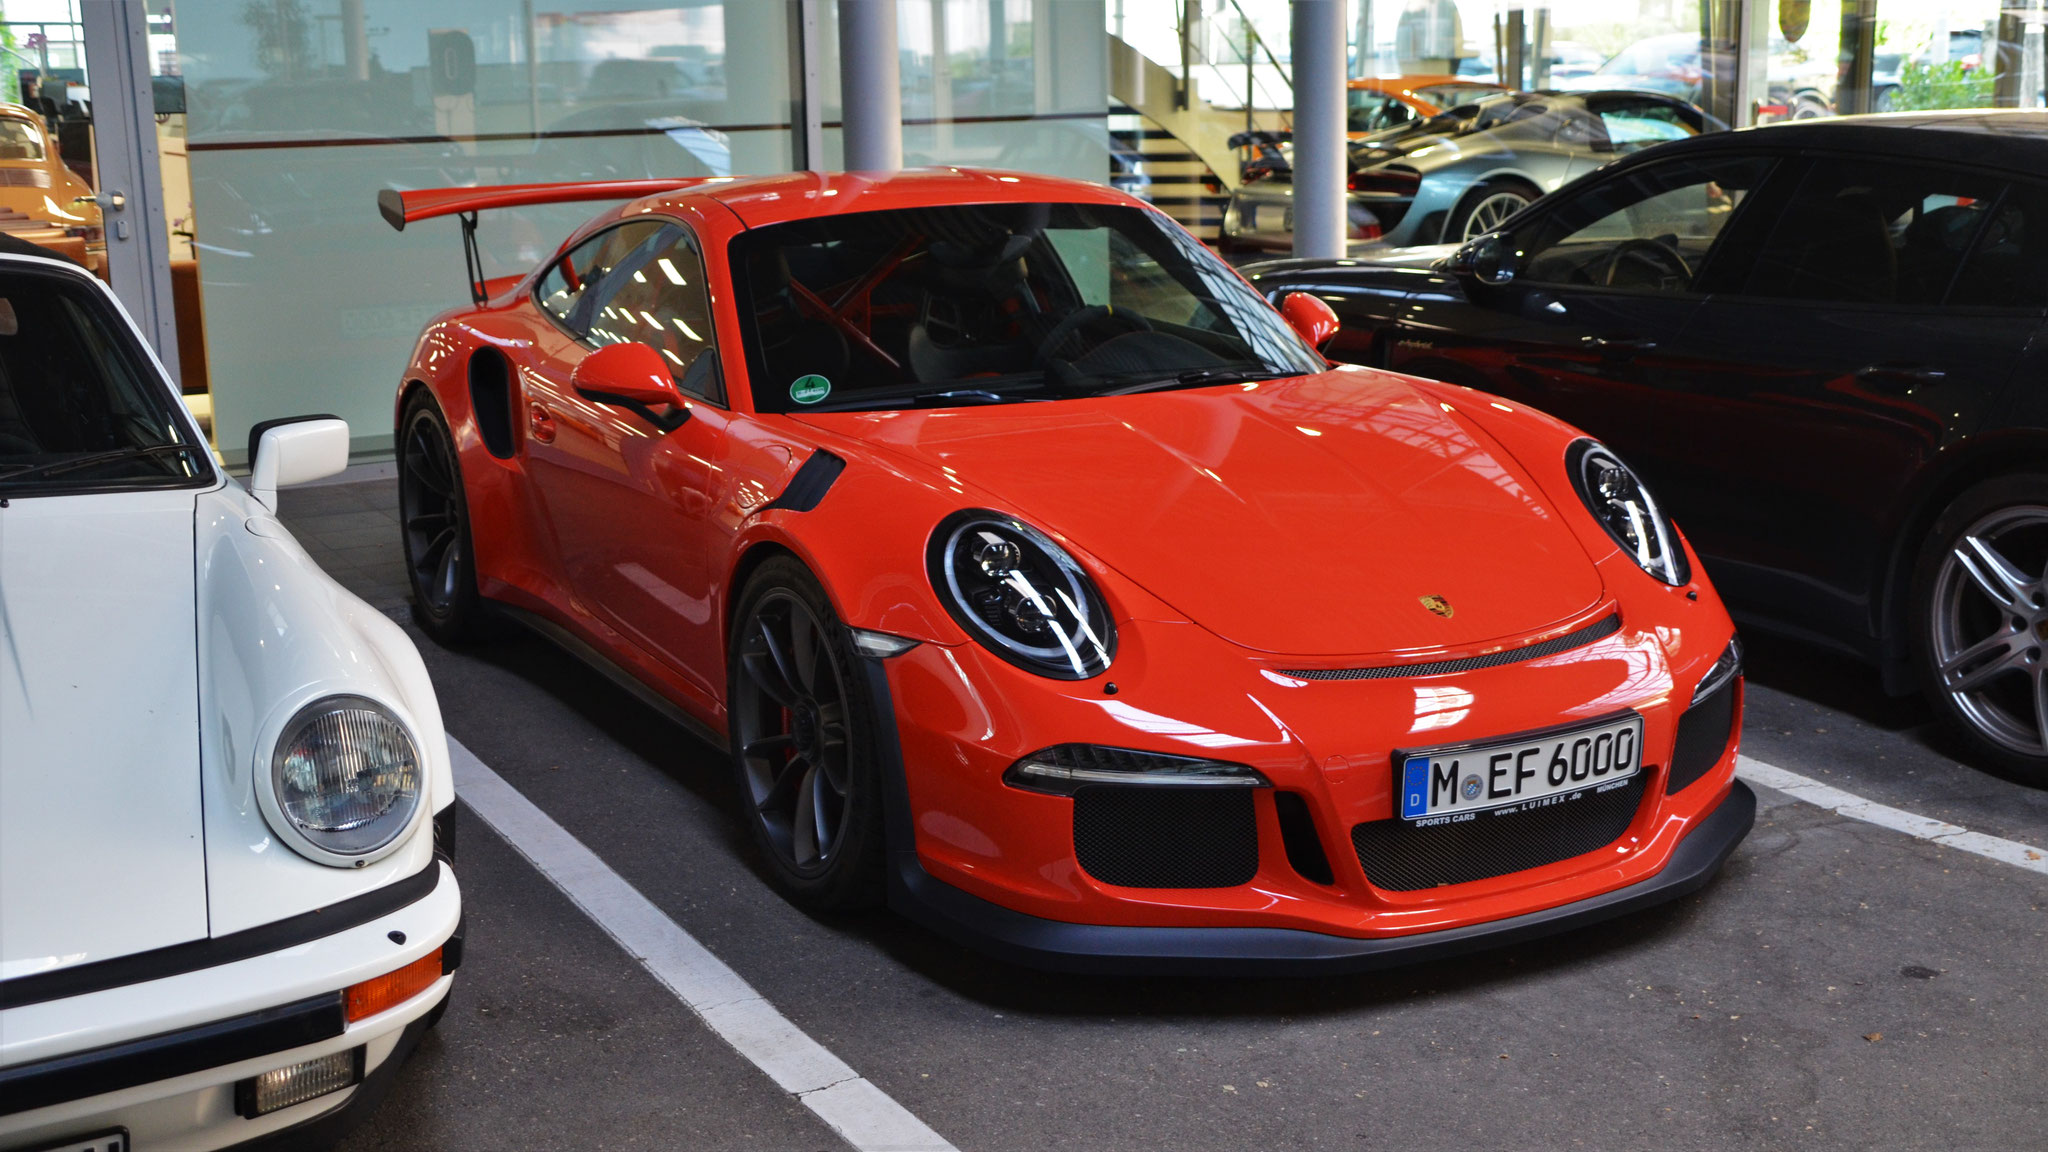 Porsche 911 GT3 RS - M-EF-6000